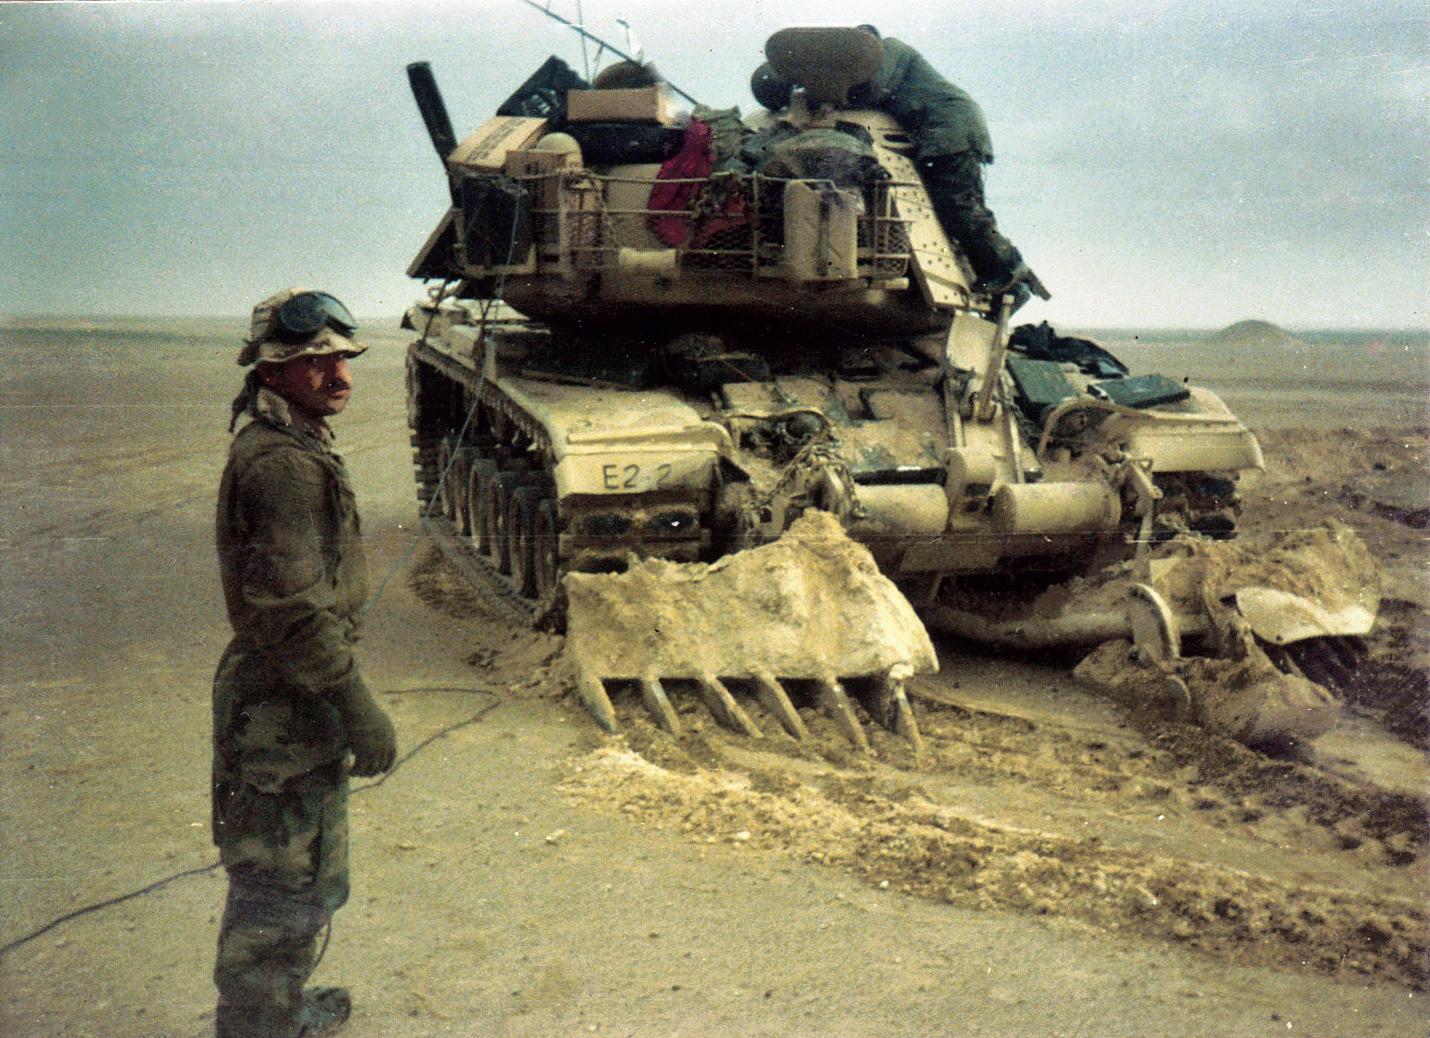 File:Tank plow U.S.Marine 3rd ceb.jpg - Wikimedia Commons